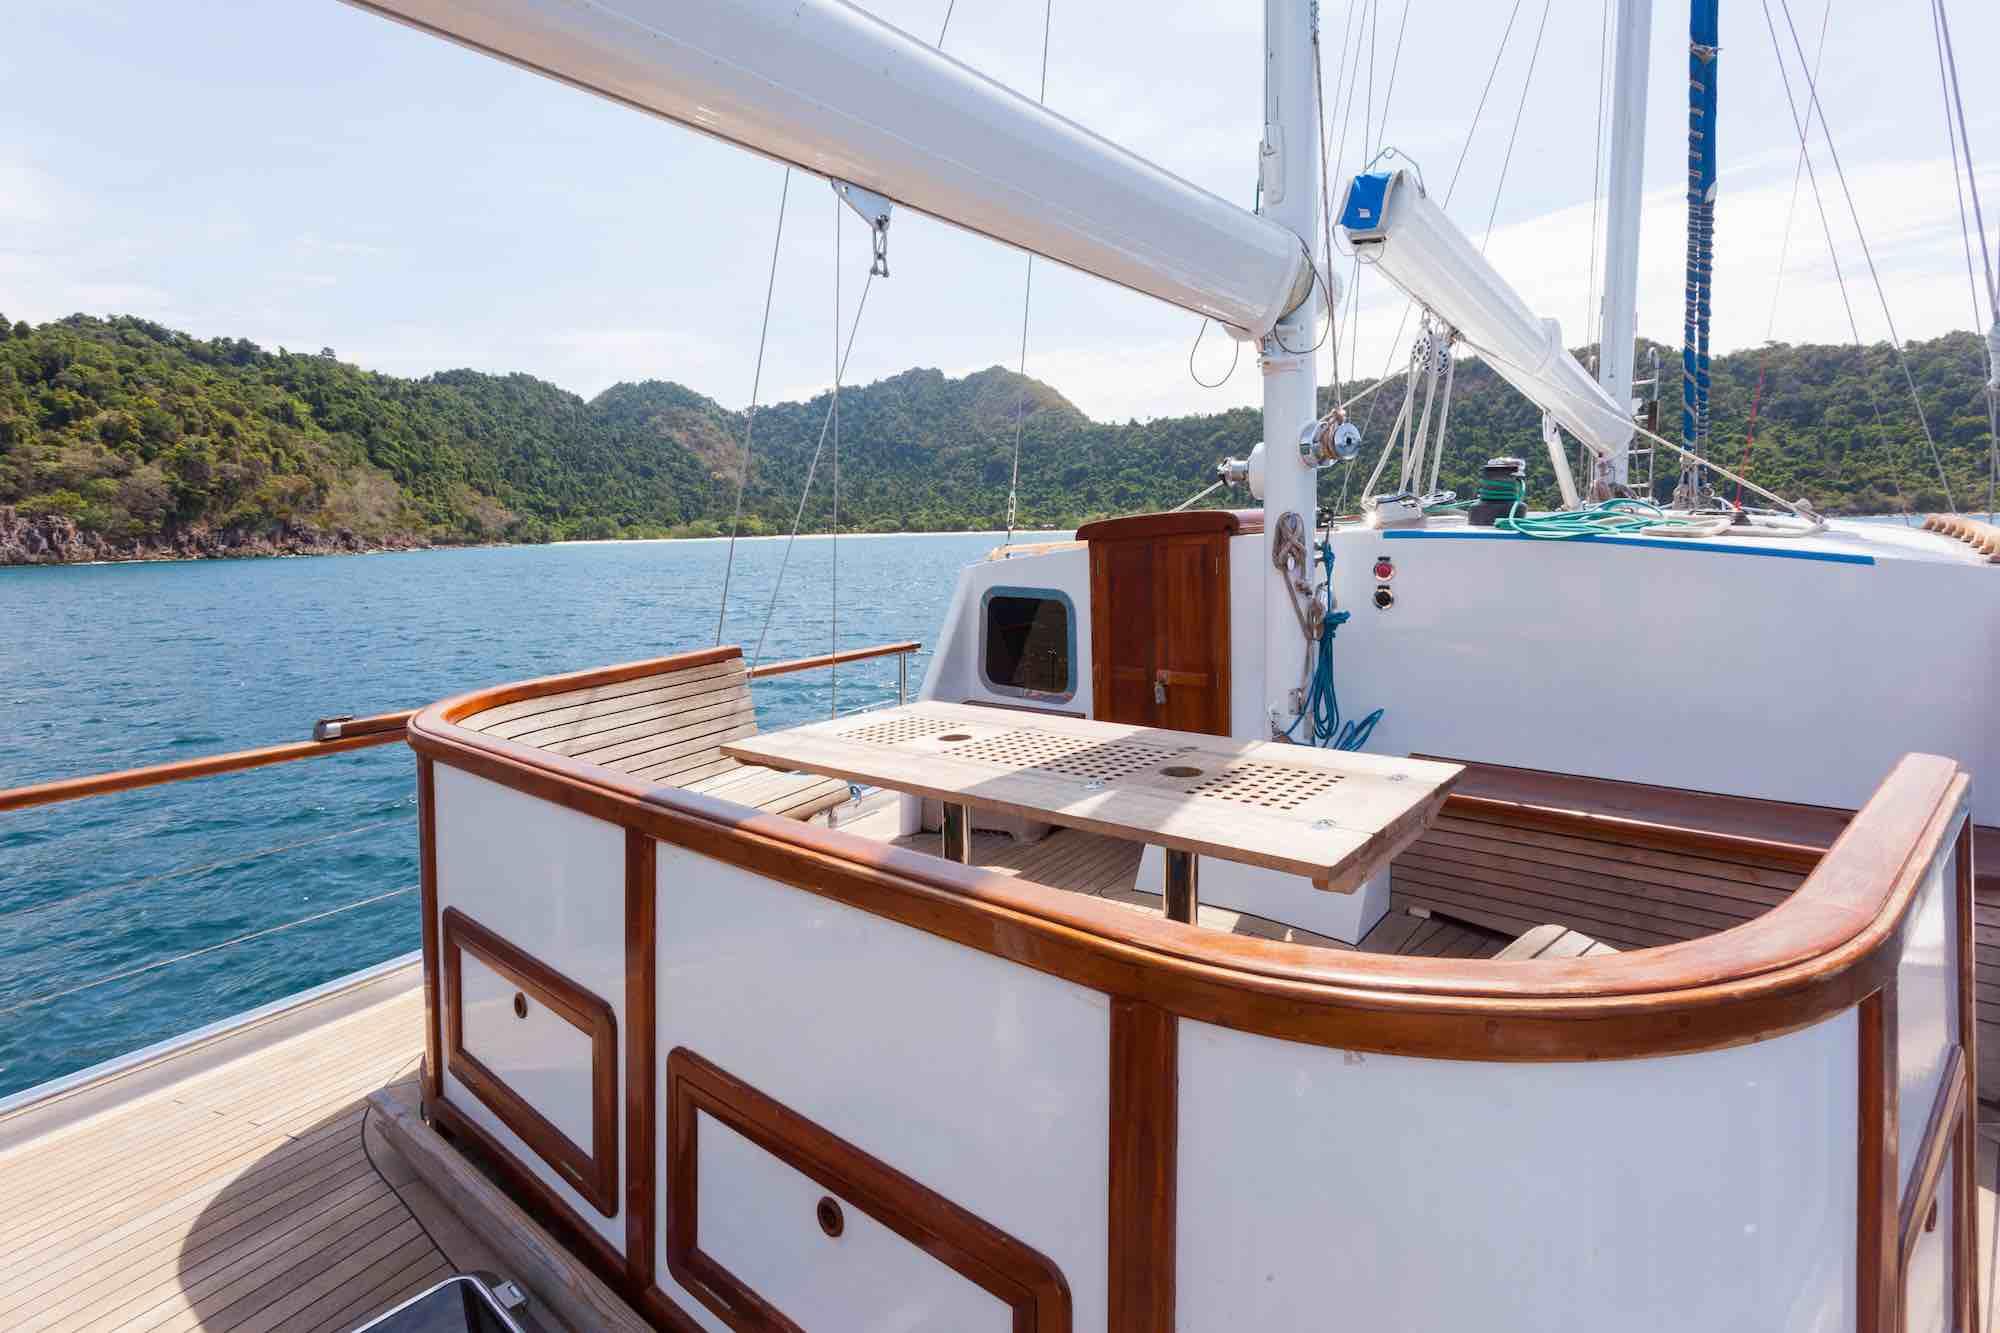 Jubilaeum_deck lounge anchoring by a beautiful island in Moken_XS.jpeg